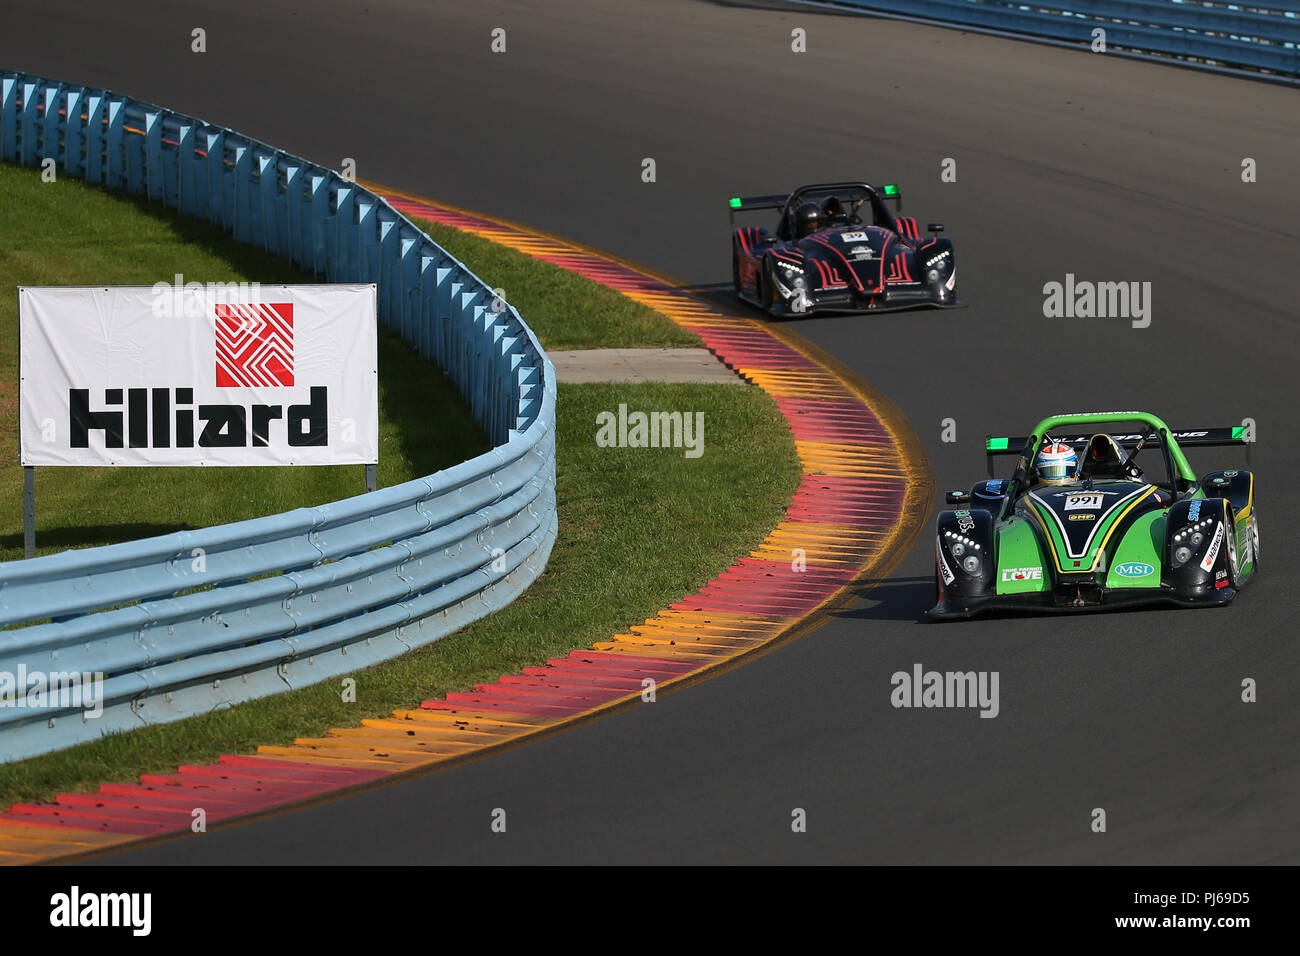 September 2, 2018: Radical Racing driver, Alan Shaw #991